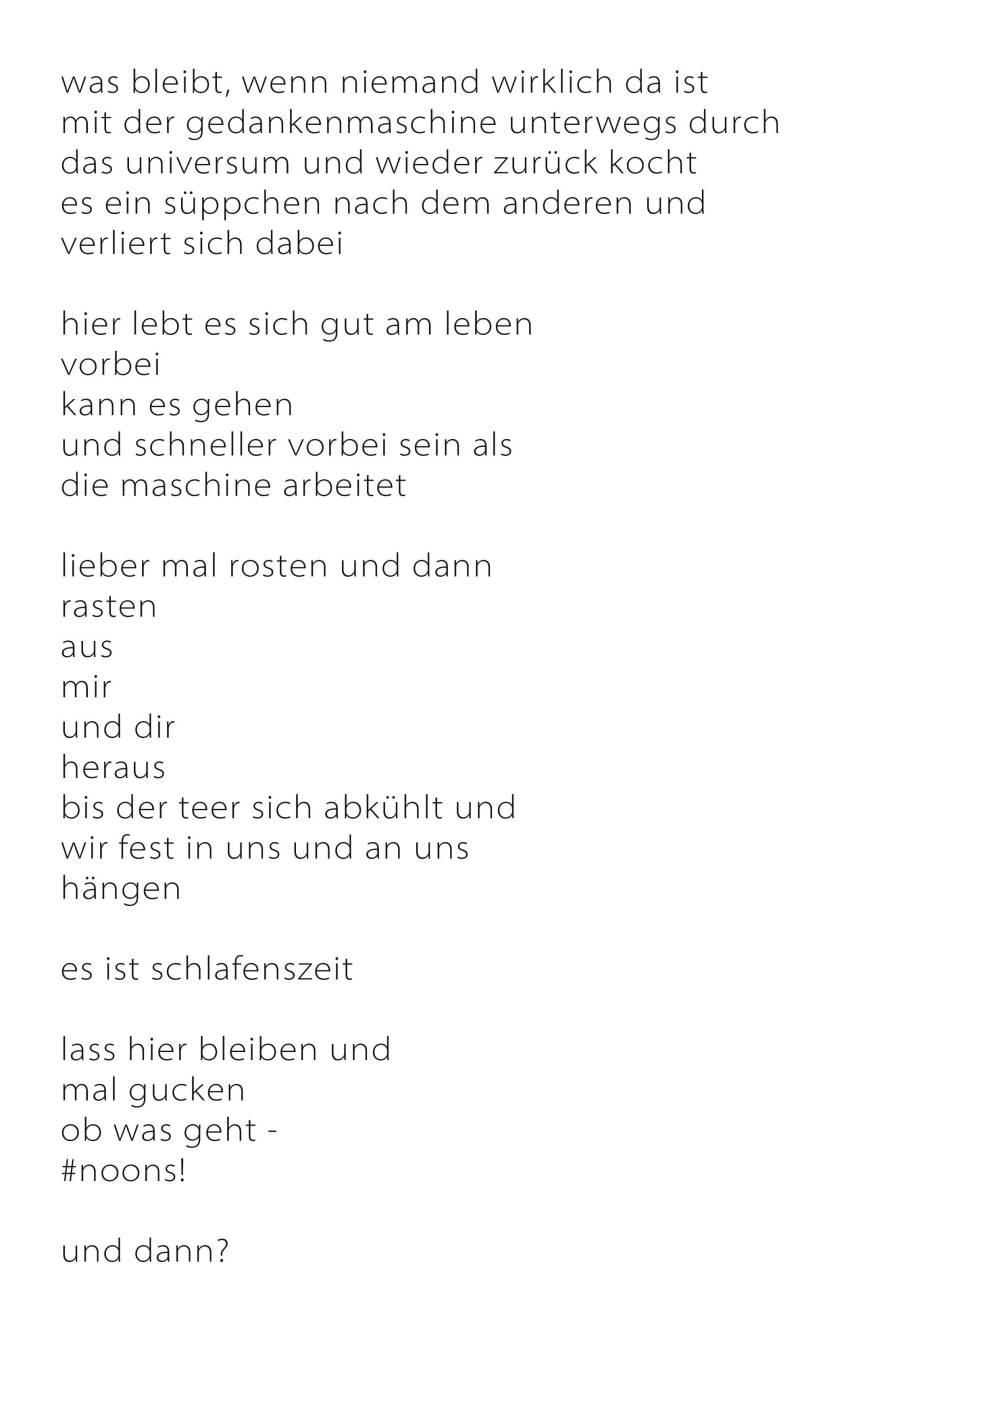 tinder-poet